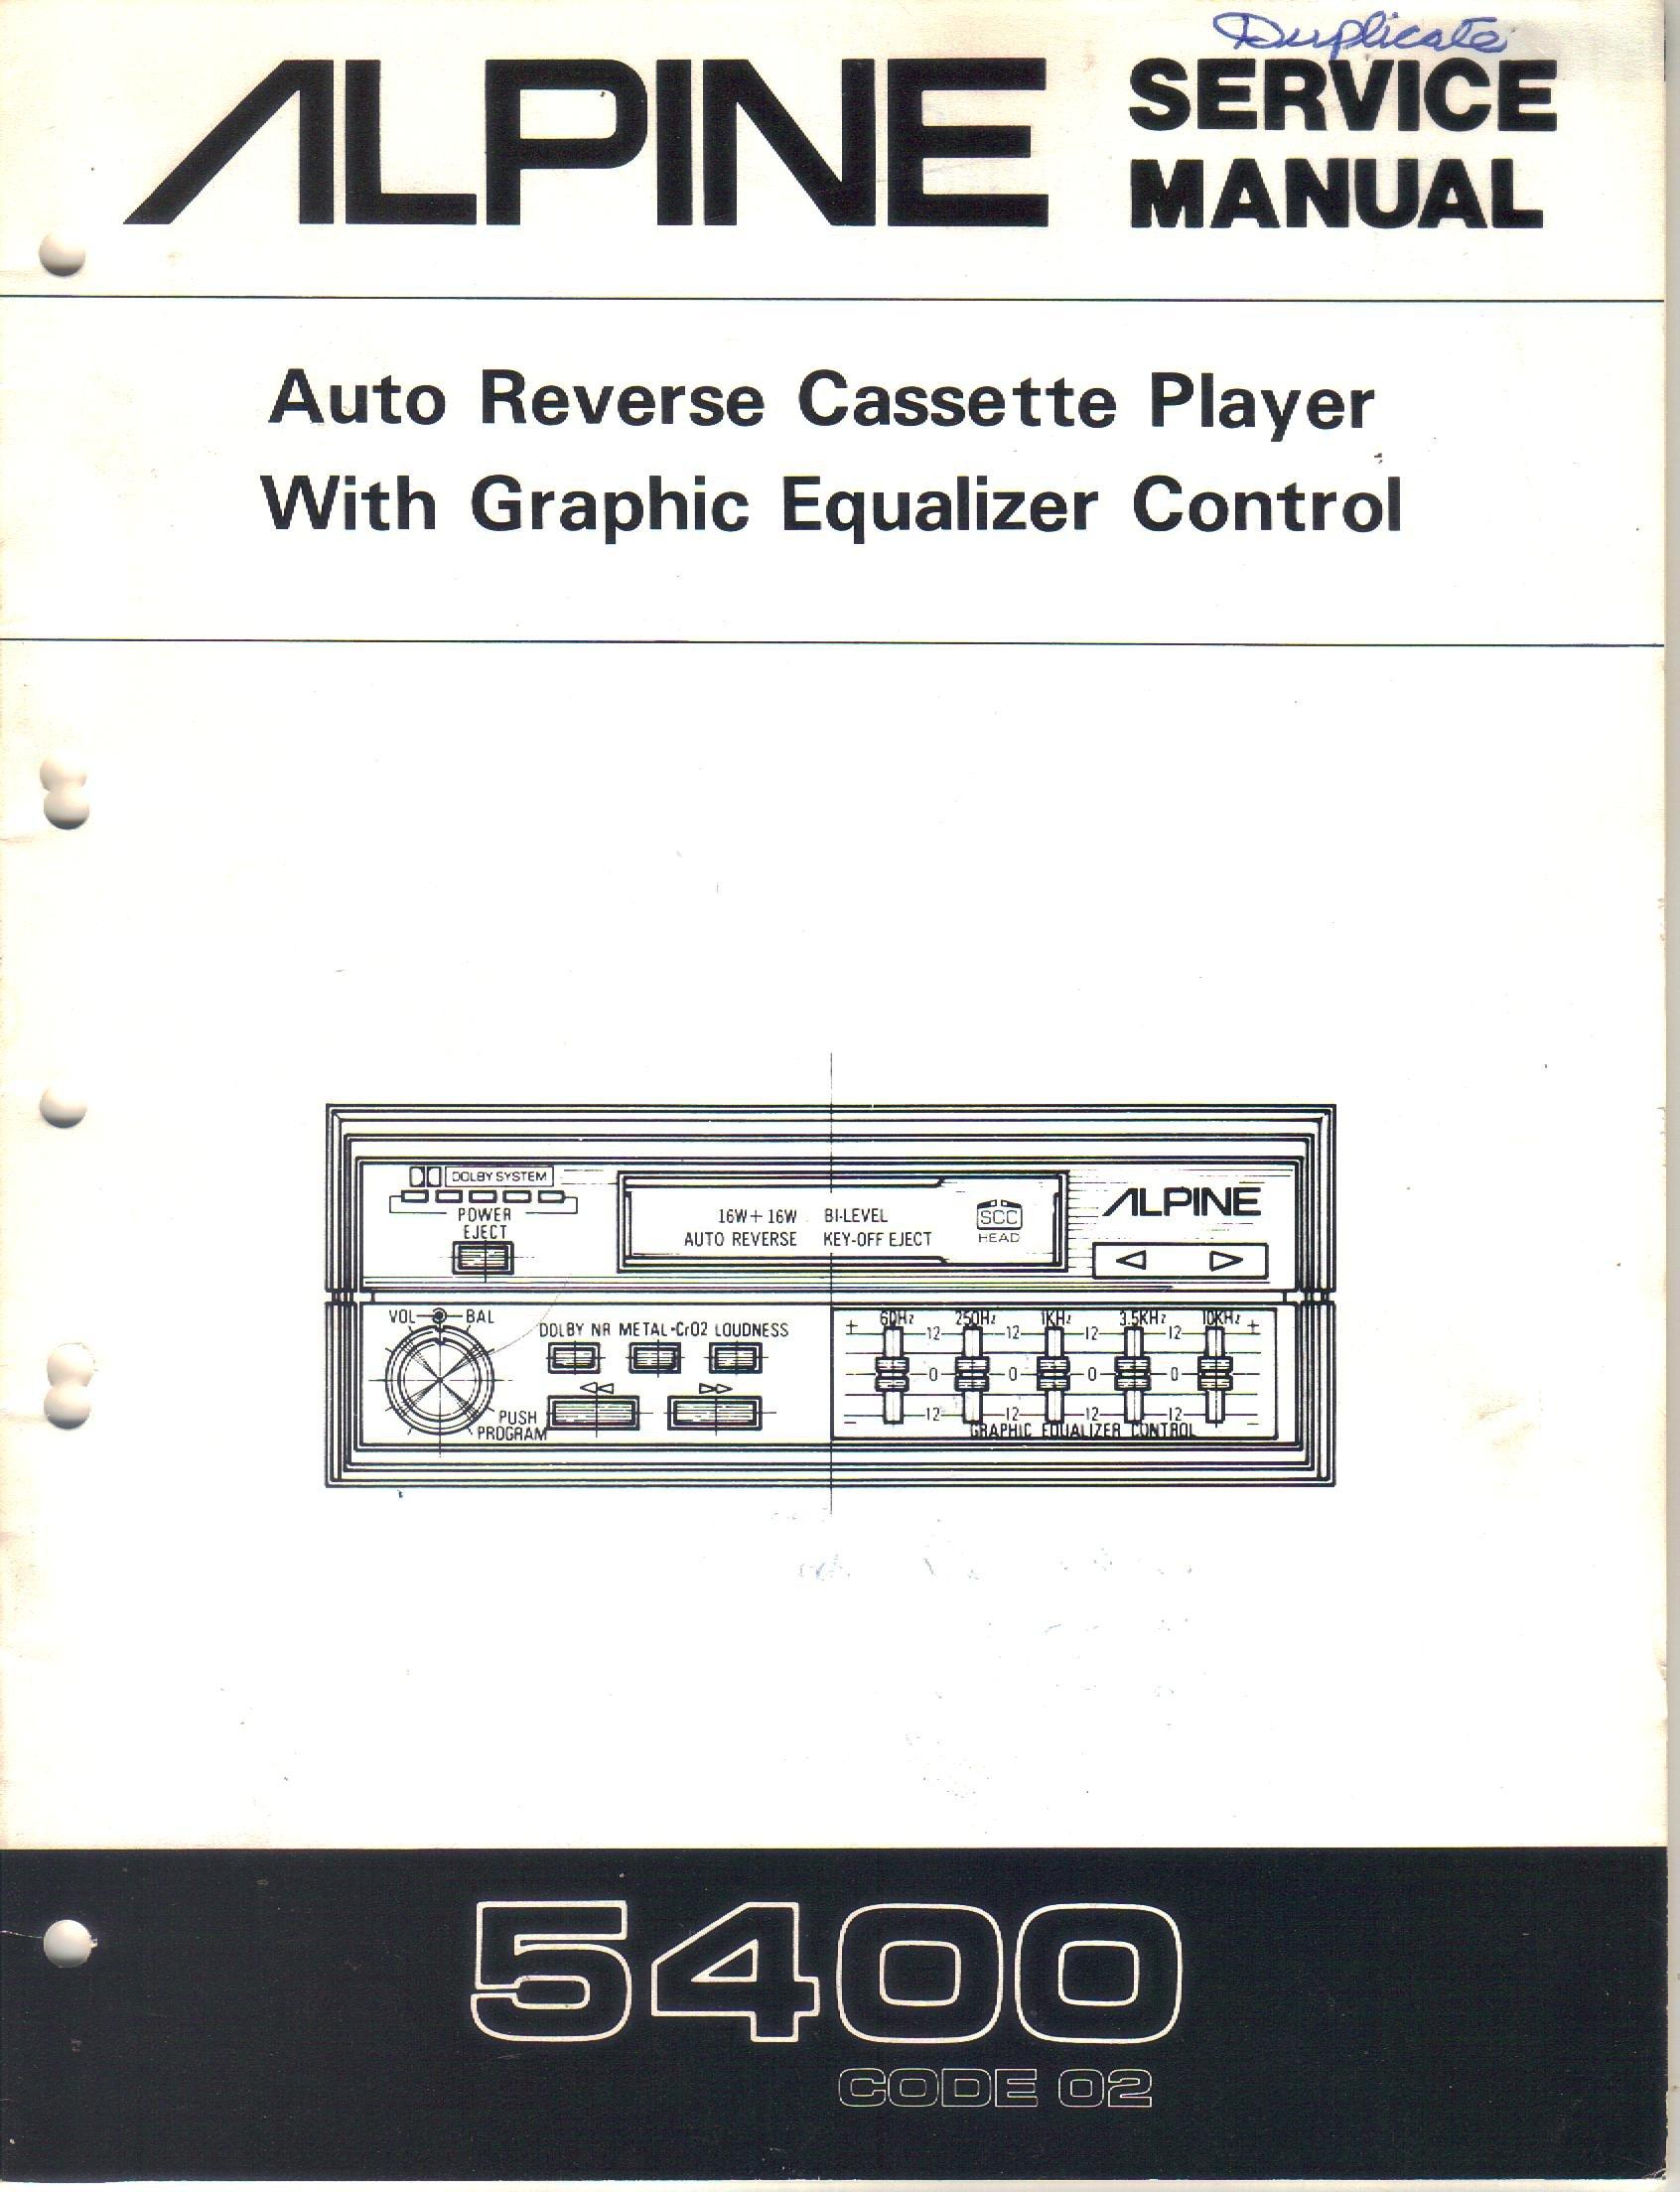 alpine 5400 auto reverse cassette player with graphic equalizer rh amazon com  alpine 3210 equalizer wiring diagram